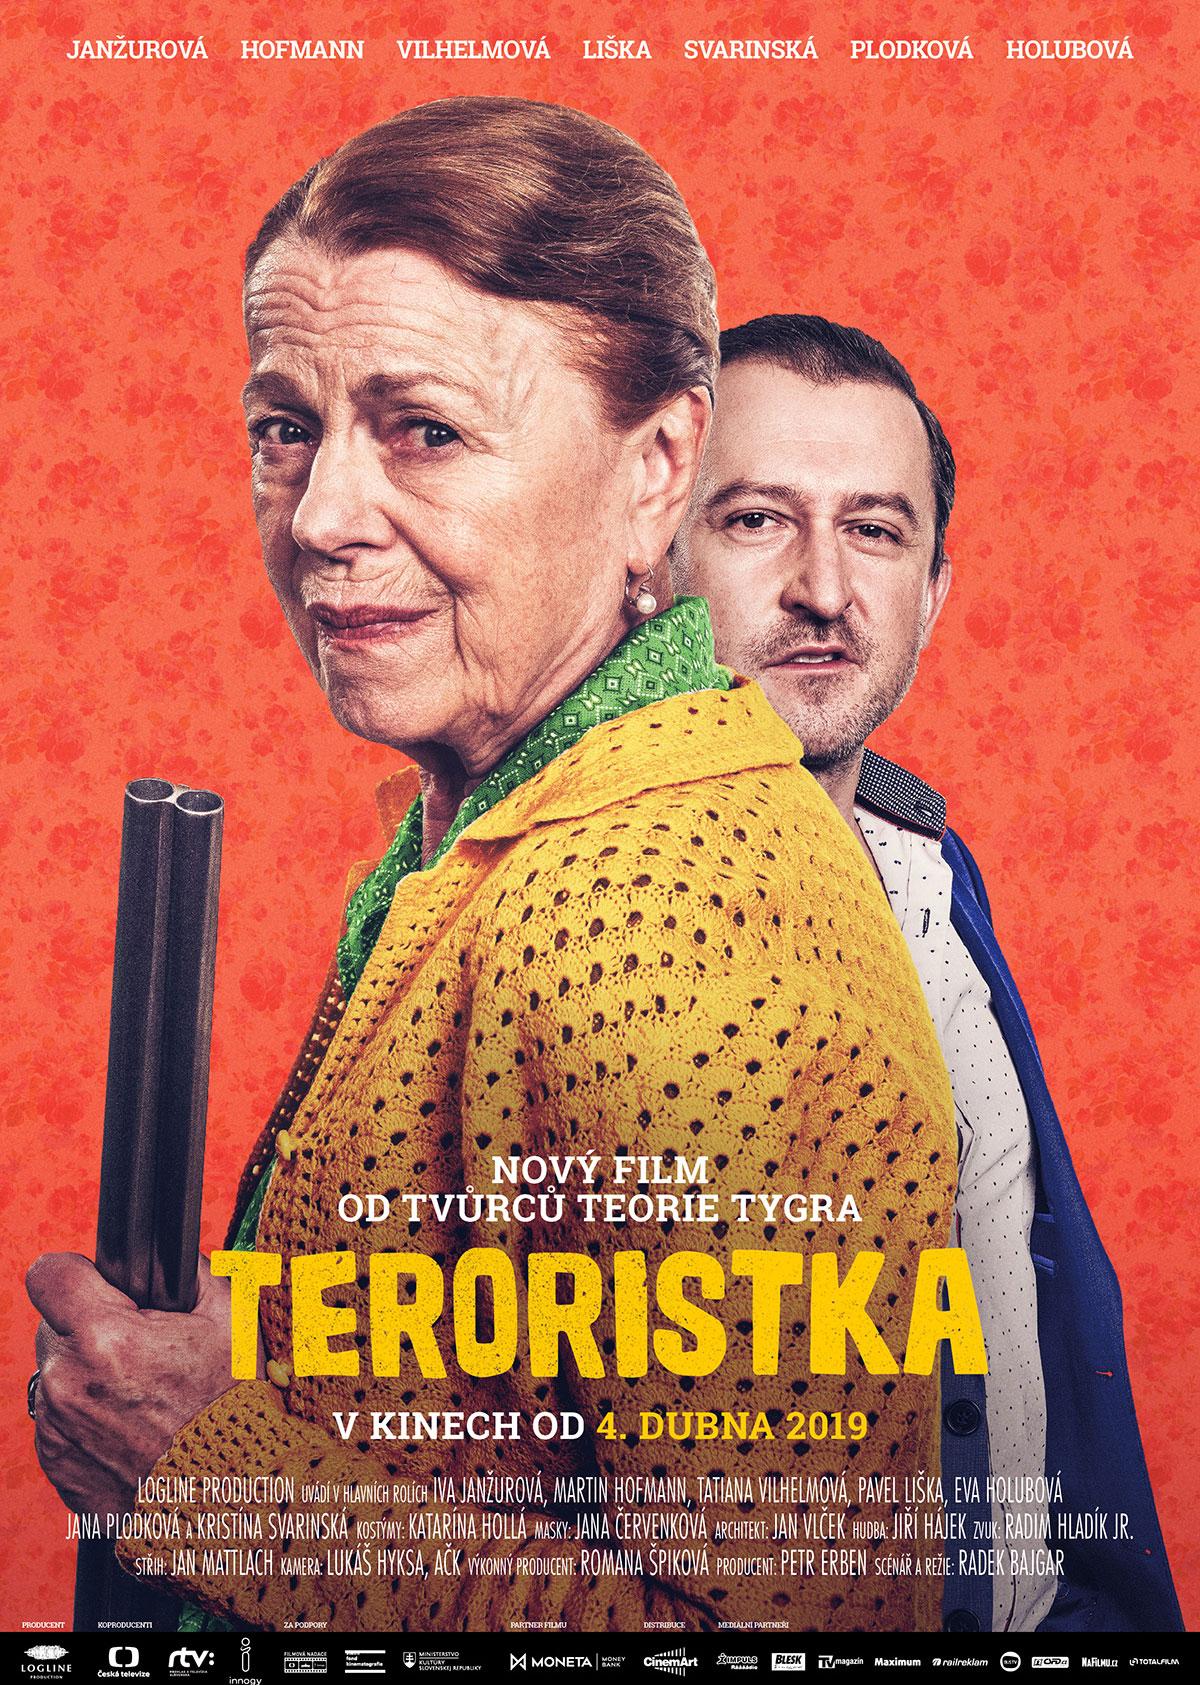 teroristka Tipy na film